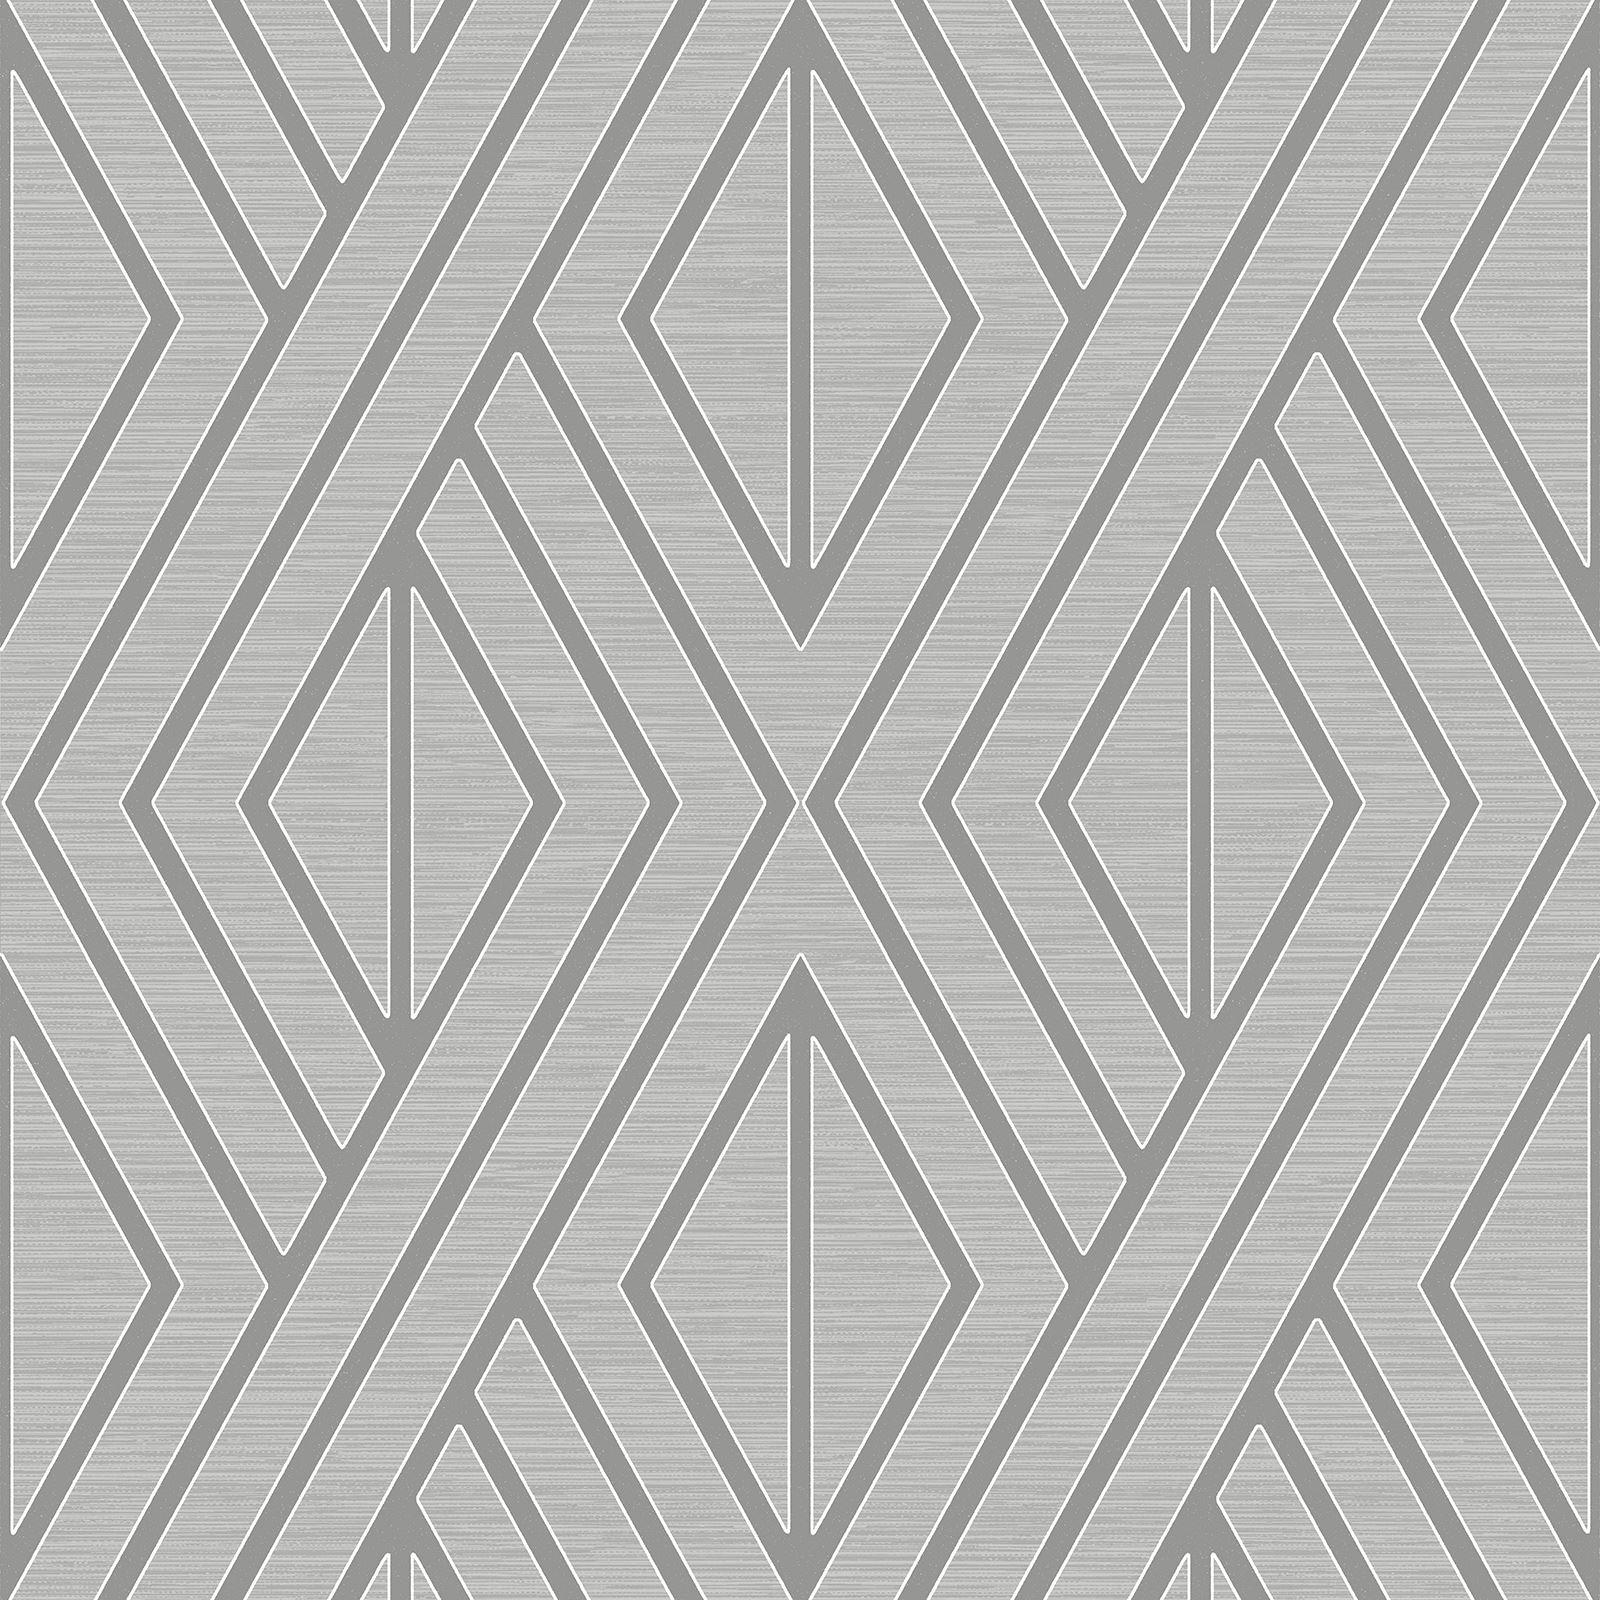 miniatura 59 - Carta da Parati Geometrica Arredamento Camera Moderno Vari Disegni e Colori